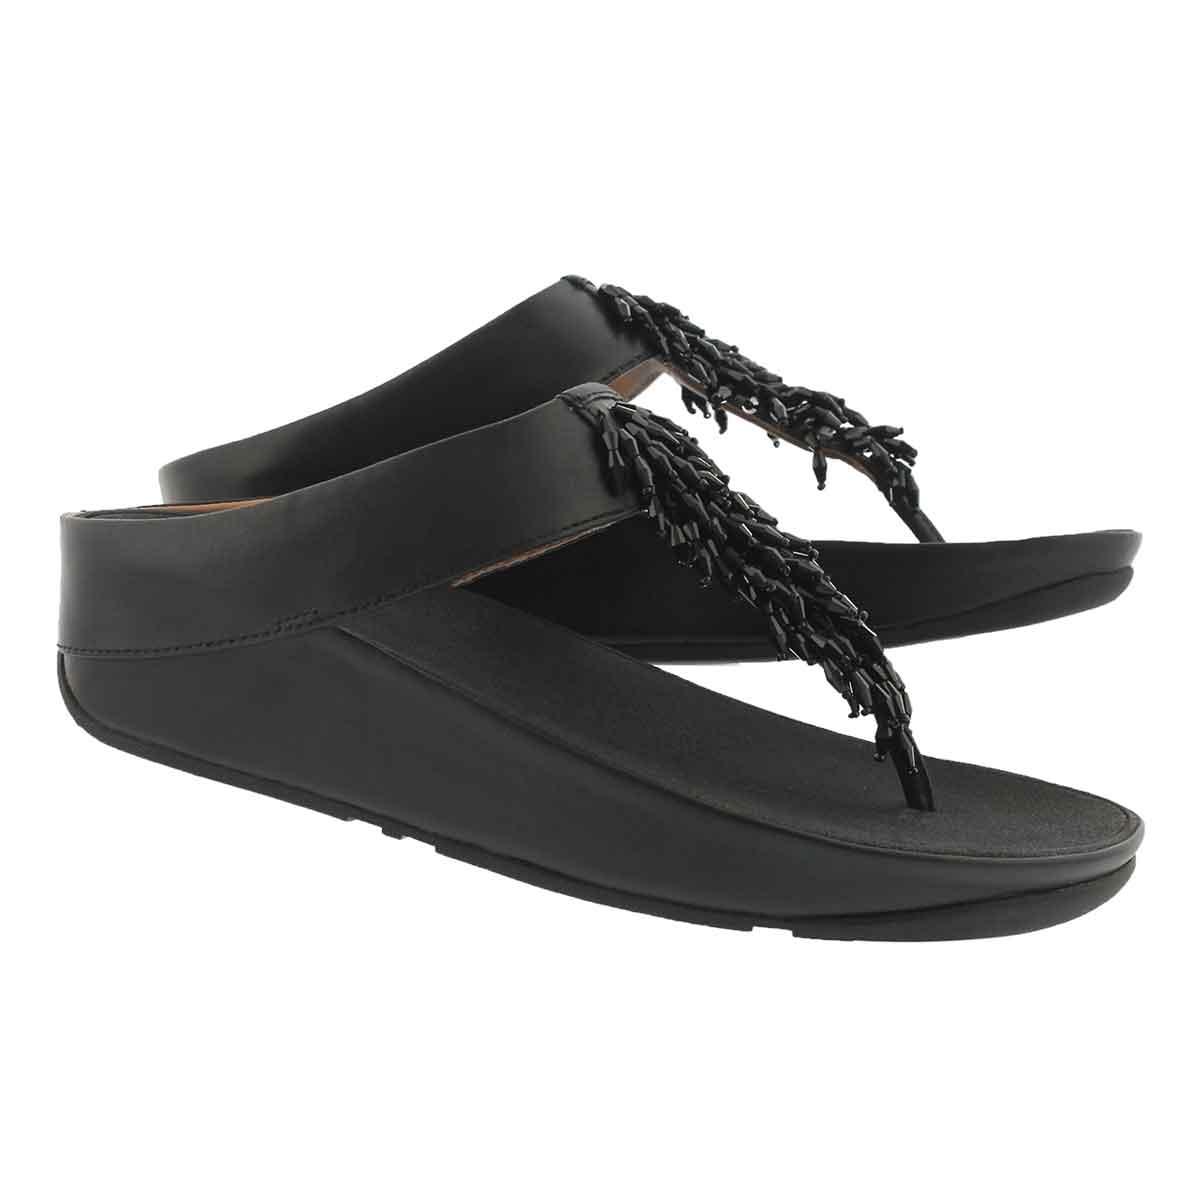 Lds Rumba black fringe thong sandal